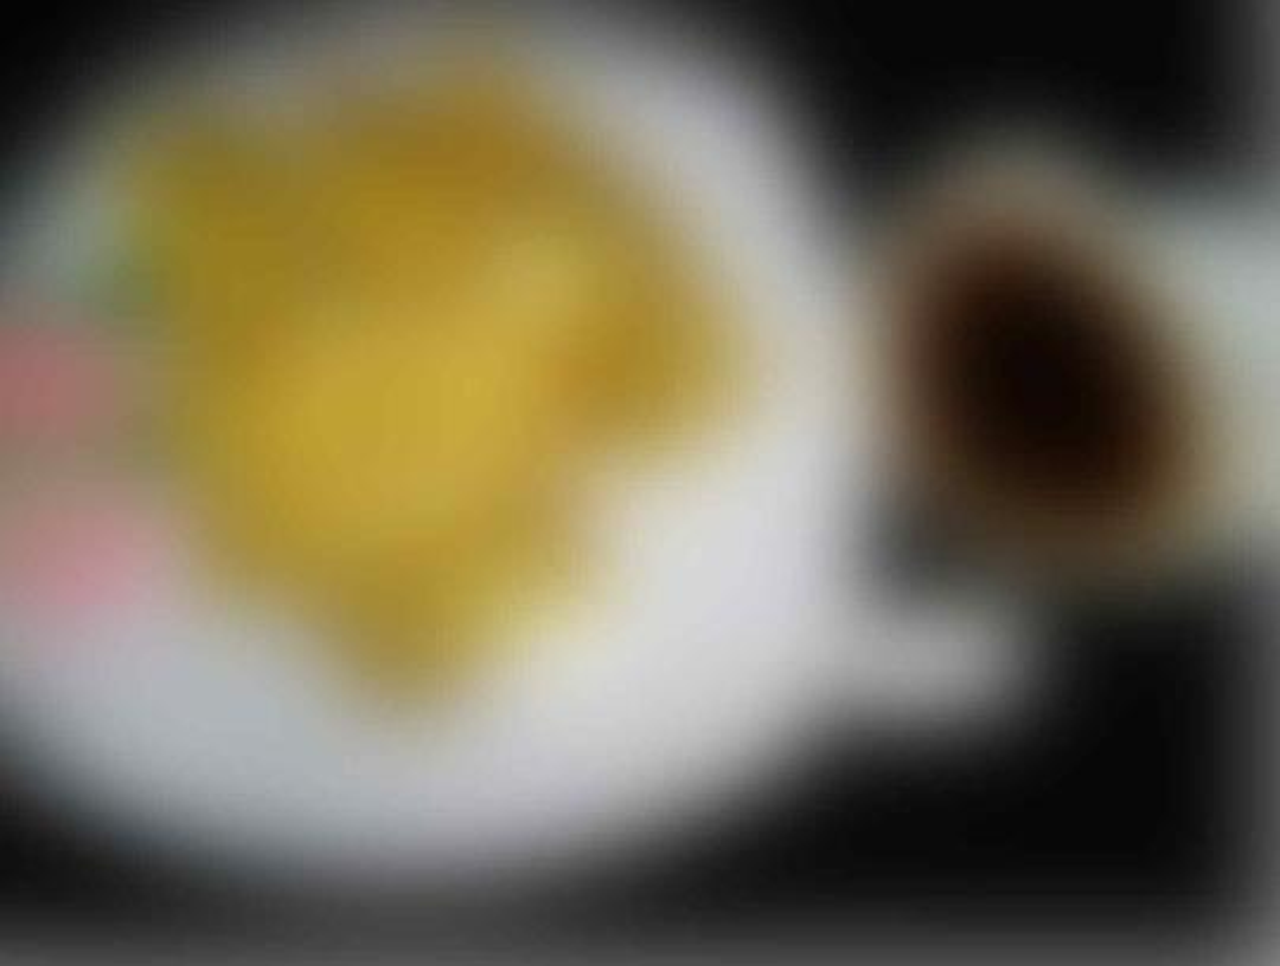 [COCooking] Ga Cuma Ayam, Singkong Geprek Pun Ane Cobain #AslinyaLo